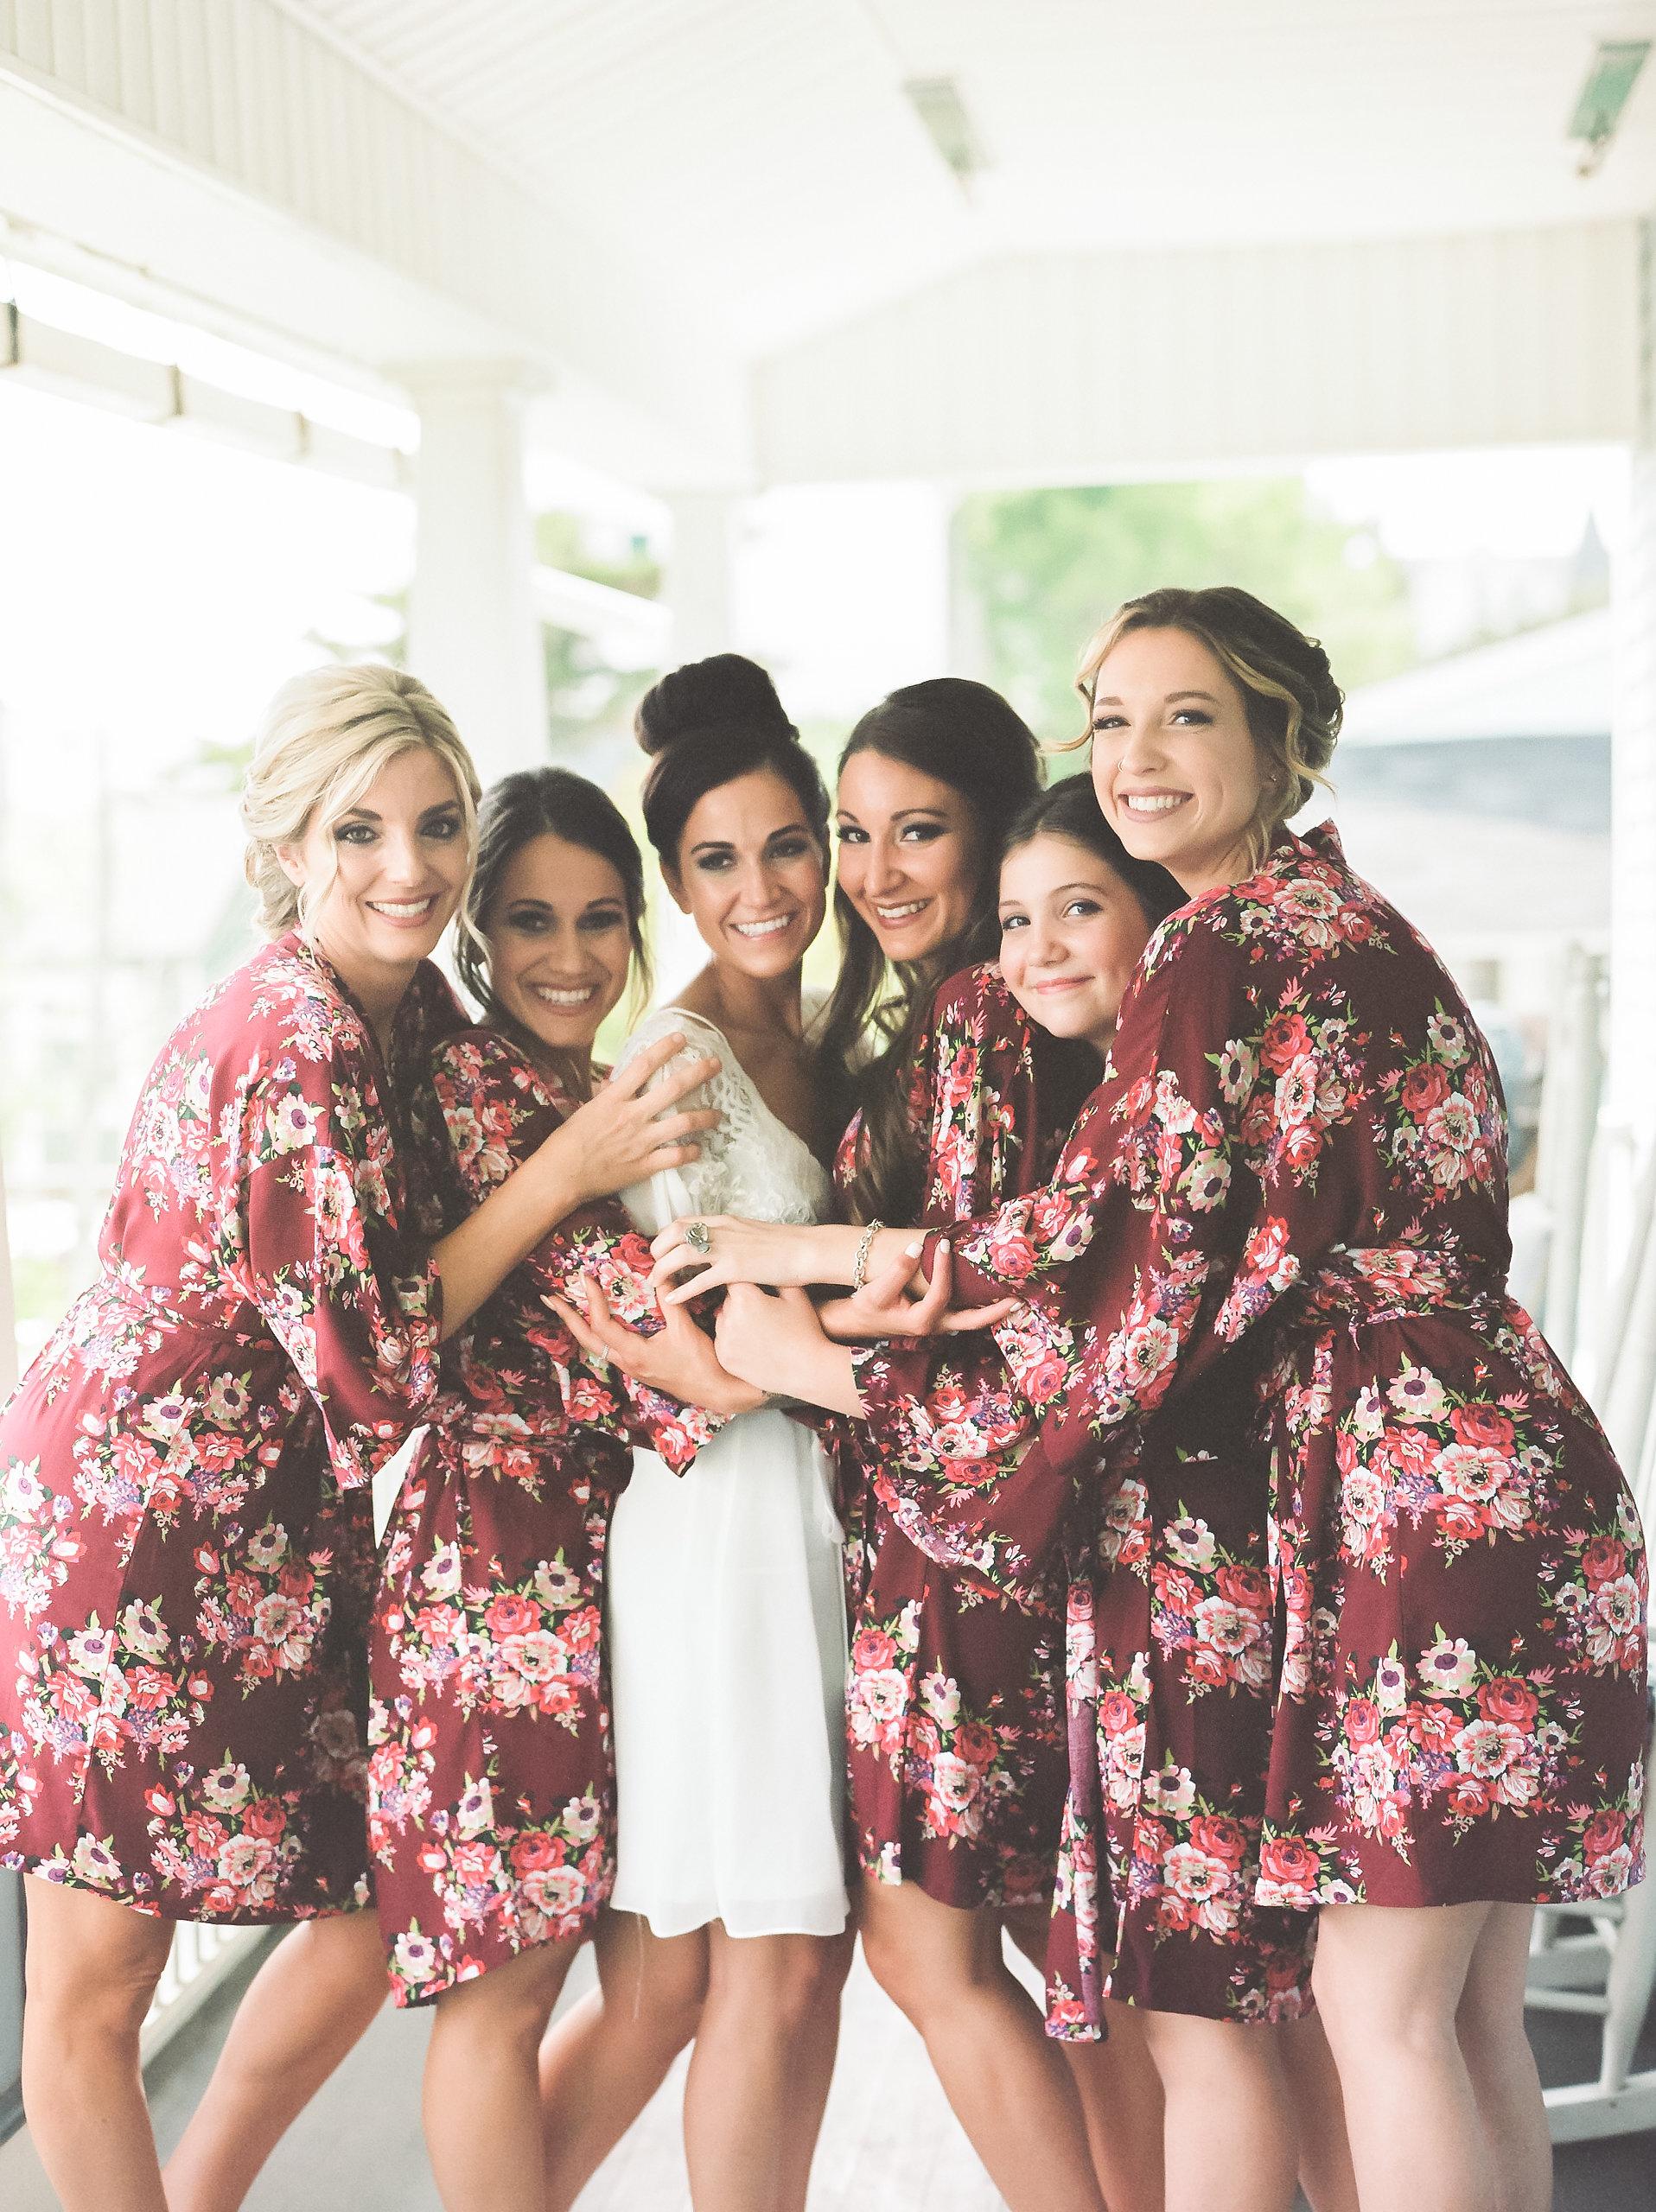 MagdalenaStudios_WeddingPhotographer_WillowCreekWinery_CarissaJoe-95.jpg